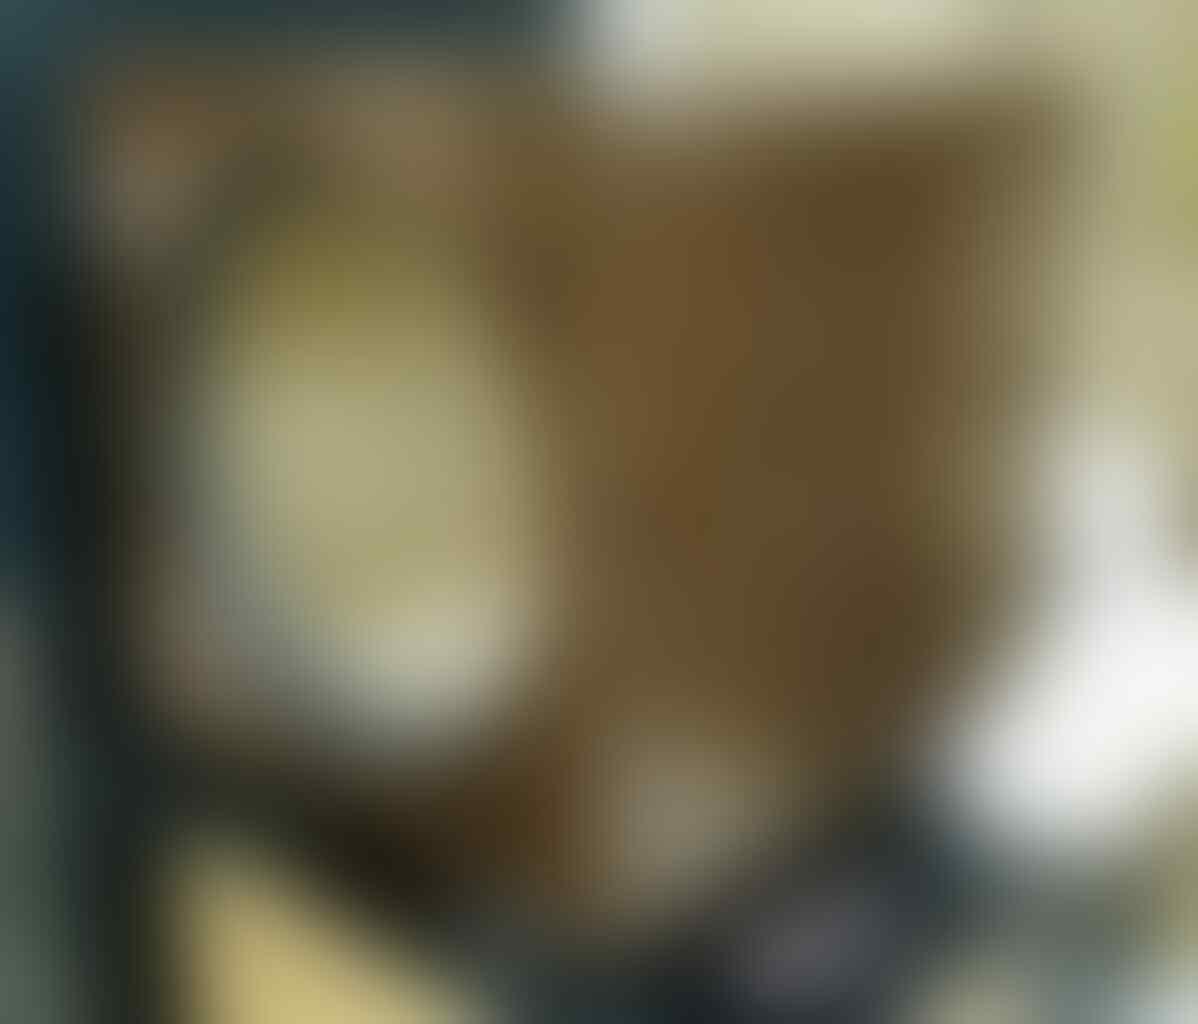 SS - Speaker Aktif home made (update)